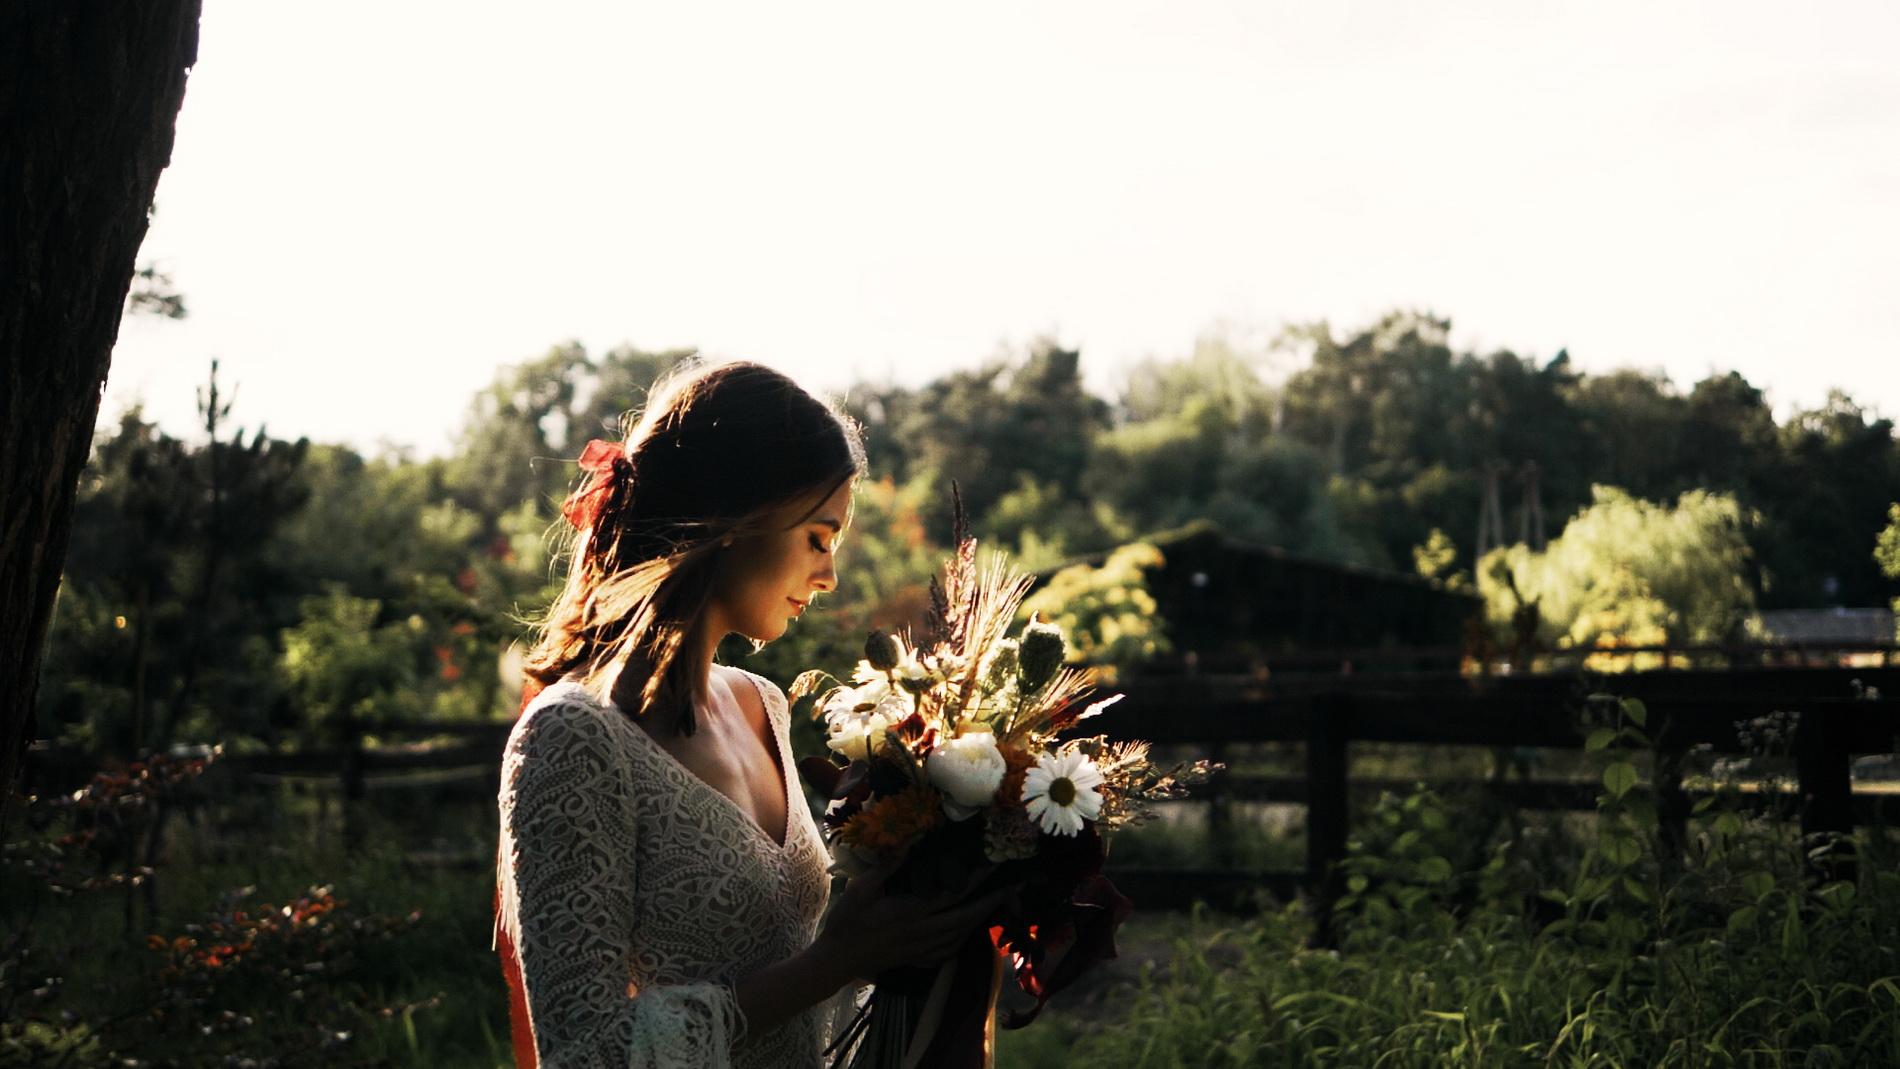 wedding_editorial_art_film_portrait_videographer_sesja_slubna_stylizowana_boho_filmowca_teledysk_slubny 02 (10).jpg